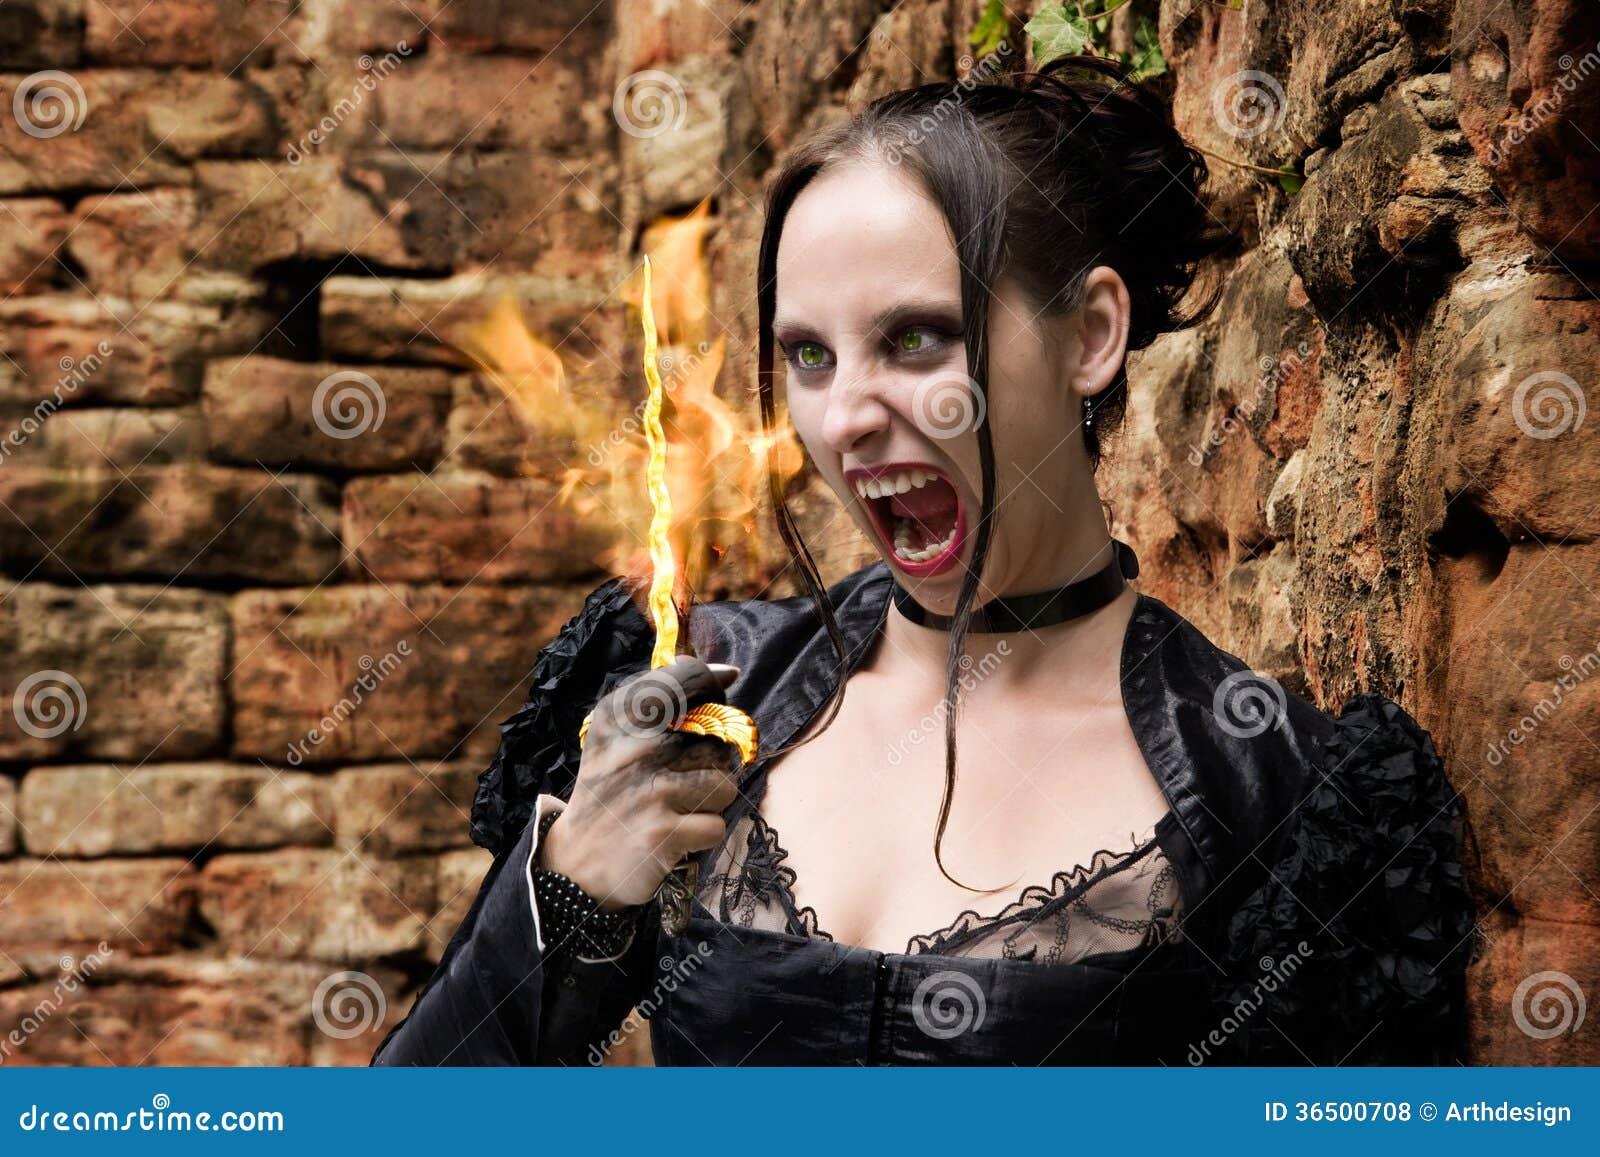 Glowing Dagger Stock Photo. Image Of Culture, Ache